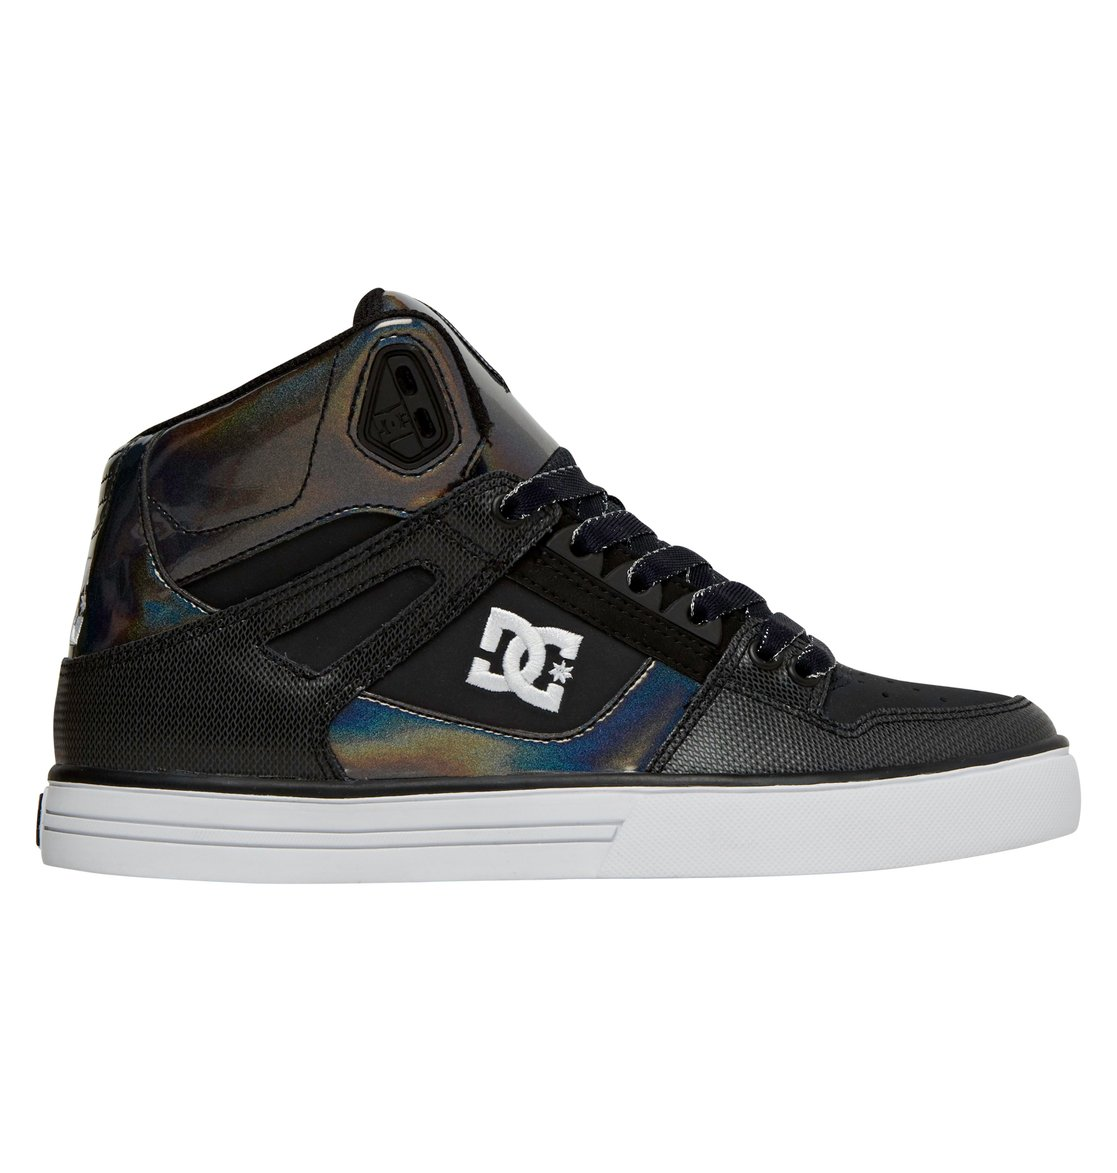 c9409676b3 0 Pure High Wc SE - high-top skate shoes ADJS400009 DC Shoes